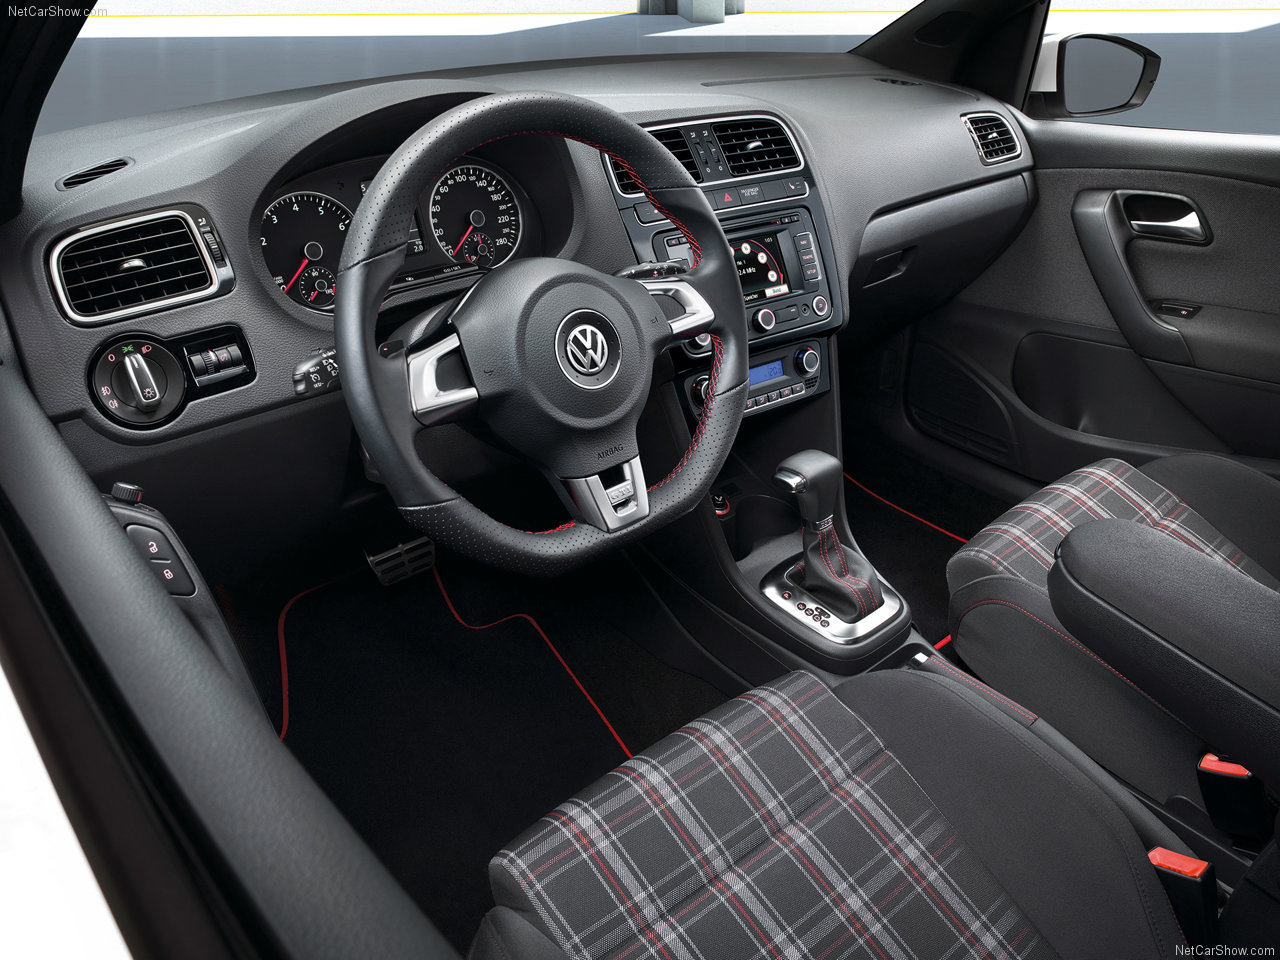 http://4.bp.blogspot.com/_lsyt_wQ2awY/TDZA78GgzVI/AAAAAAAB8L4/ahSYreQhAY4/s1600/Volkswagen-Polo_GTI_2011_1280x960_wallpaper_03.jpg